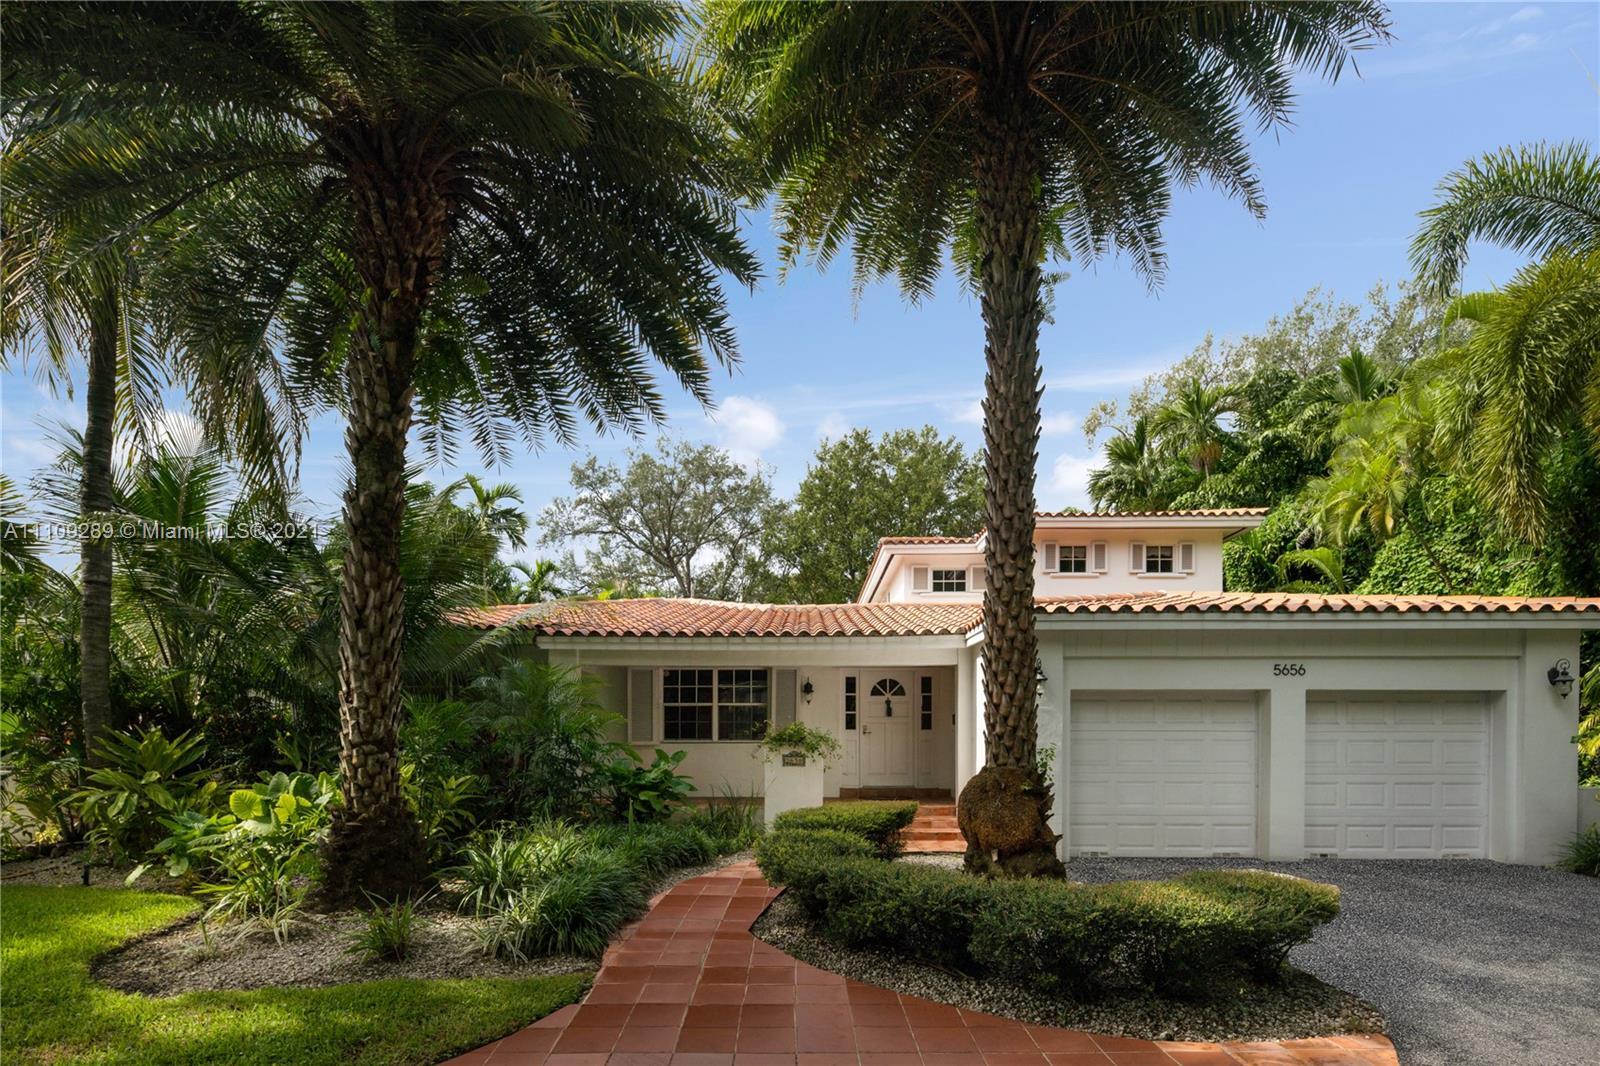 Single Family Home,For Sale,5656 Granada Blvd, Coral Gables, Florida 33146,Brickell,realty,broker,condos near me